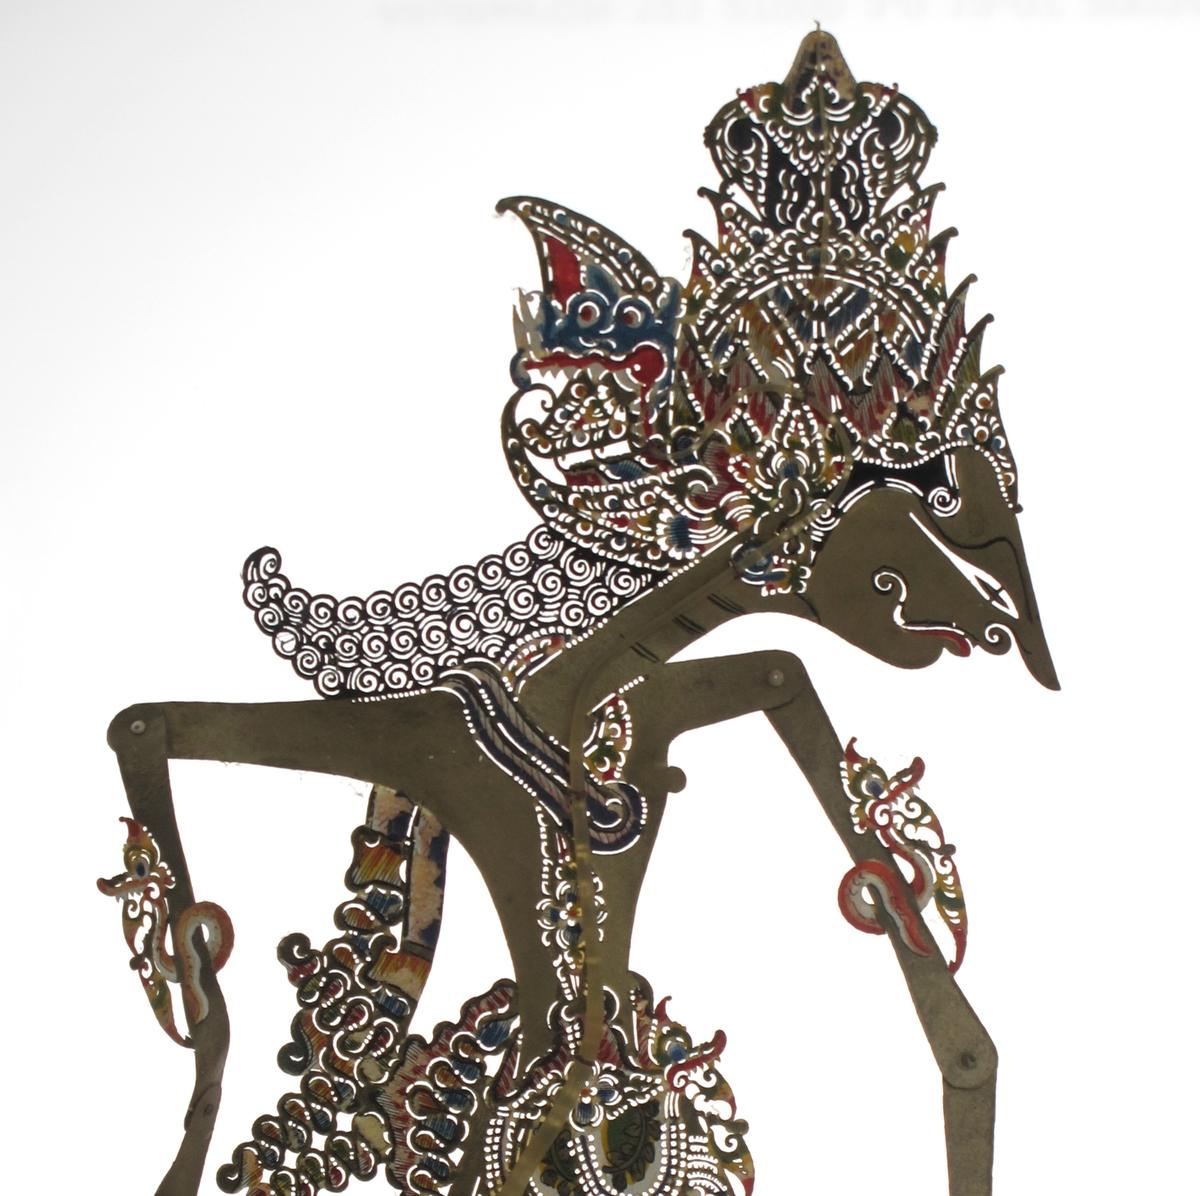 Figurene er prinsesse Sita og prins Rama fra Ayodhya.